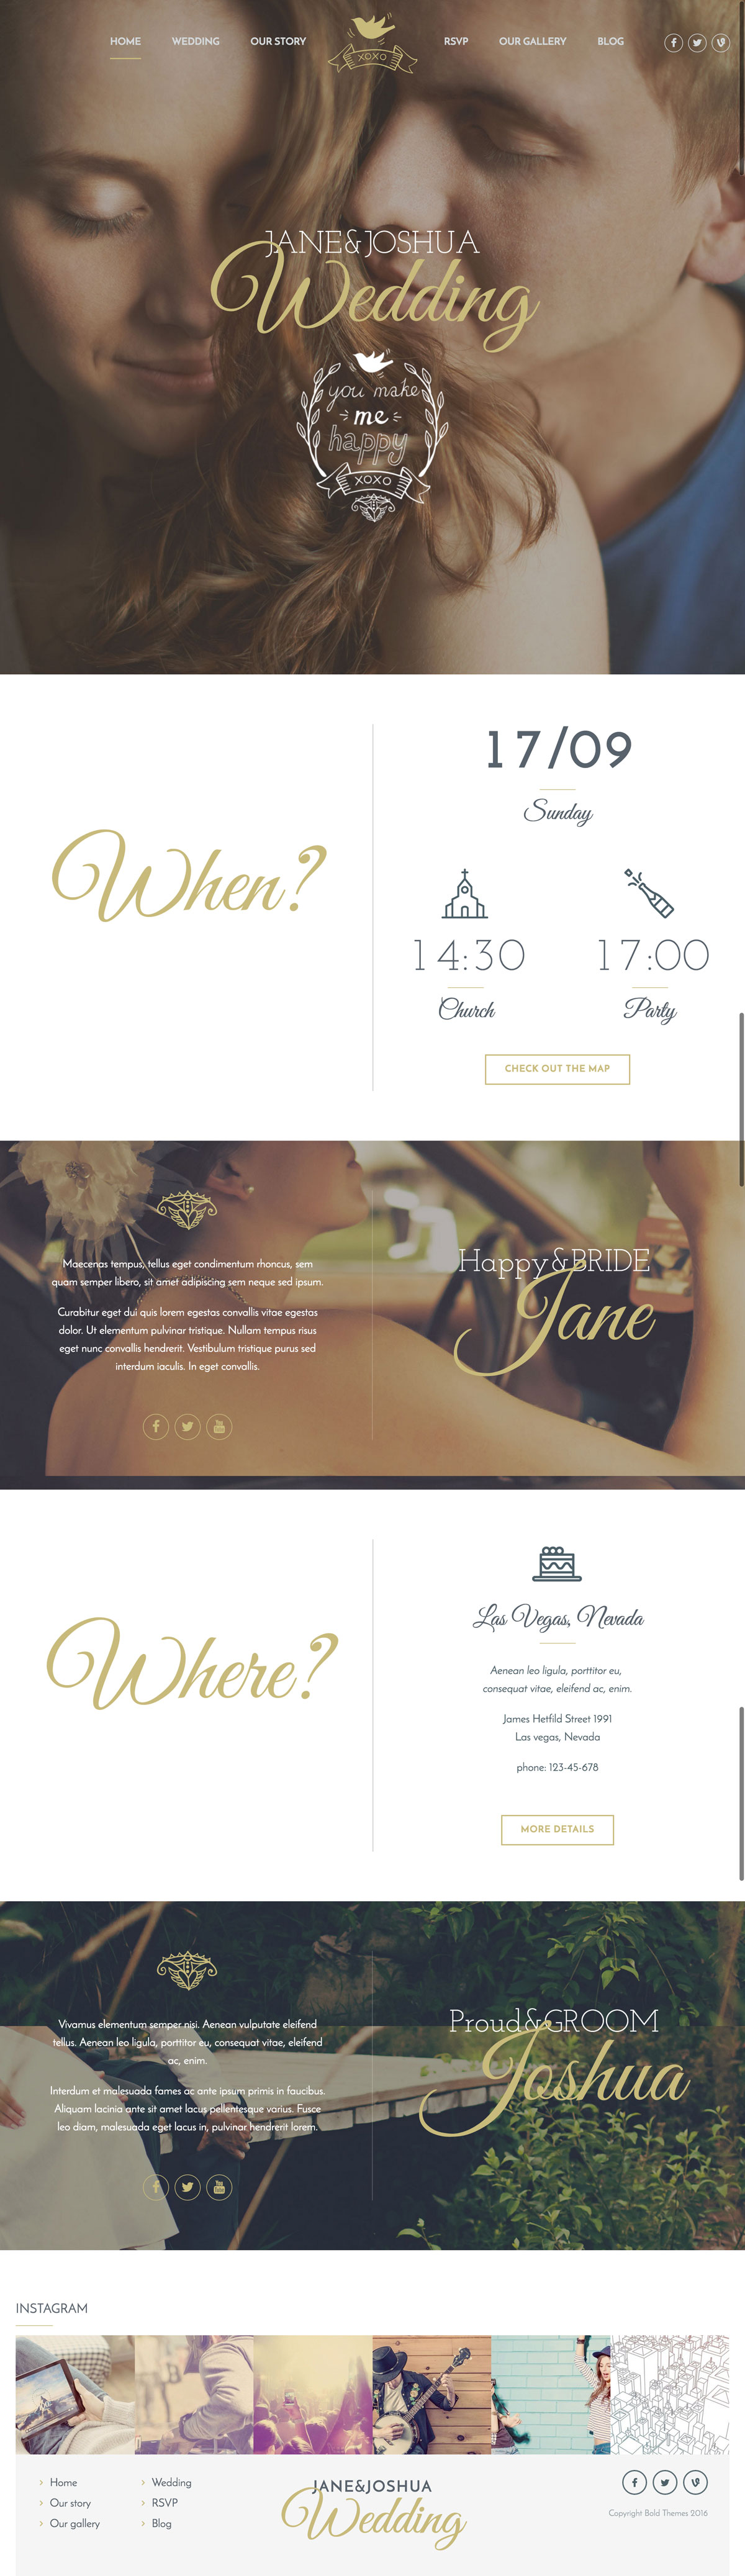 Celebration - Wedding WordPress Theme